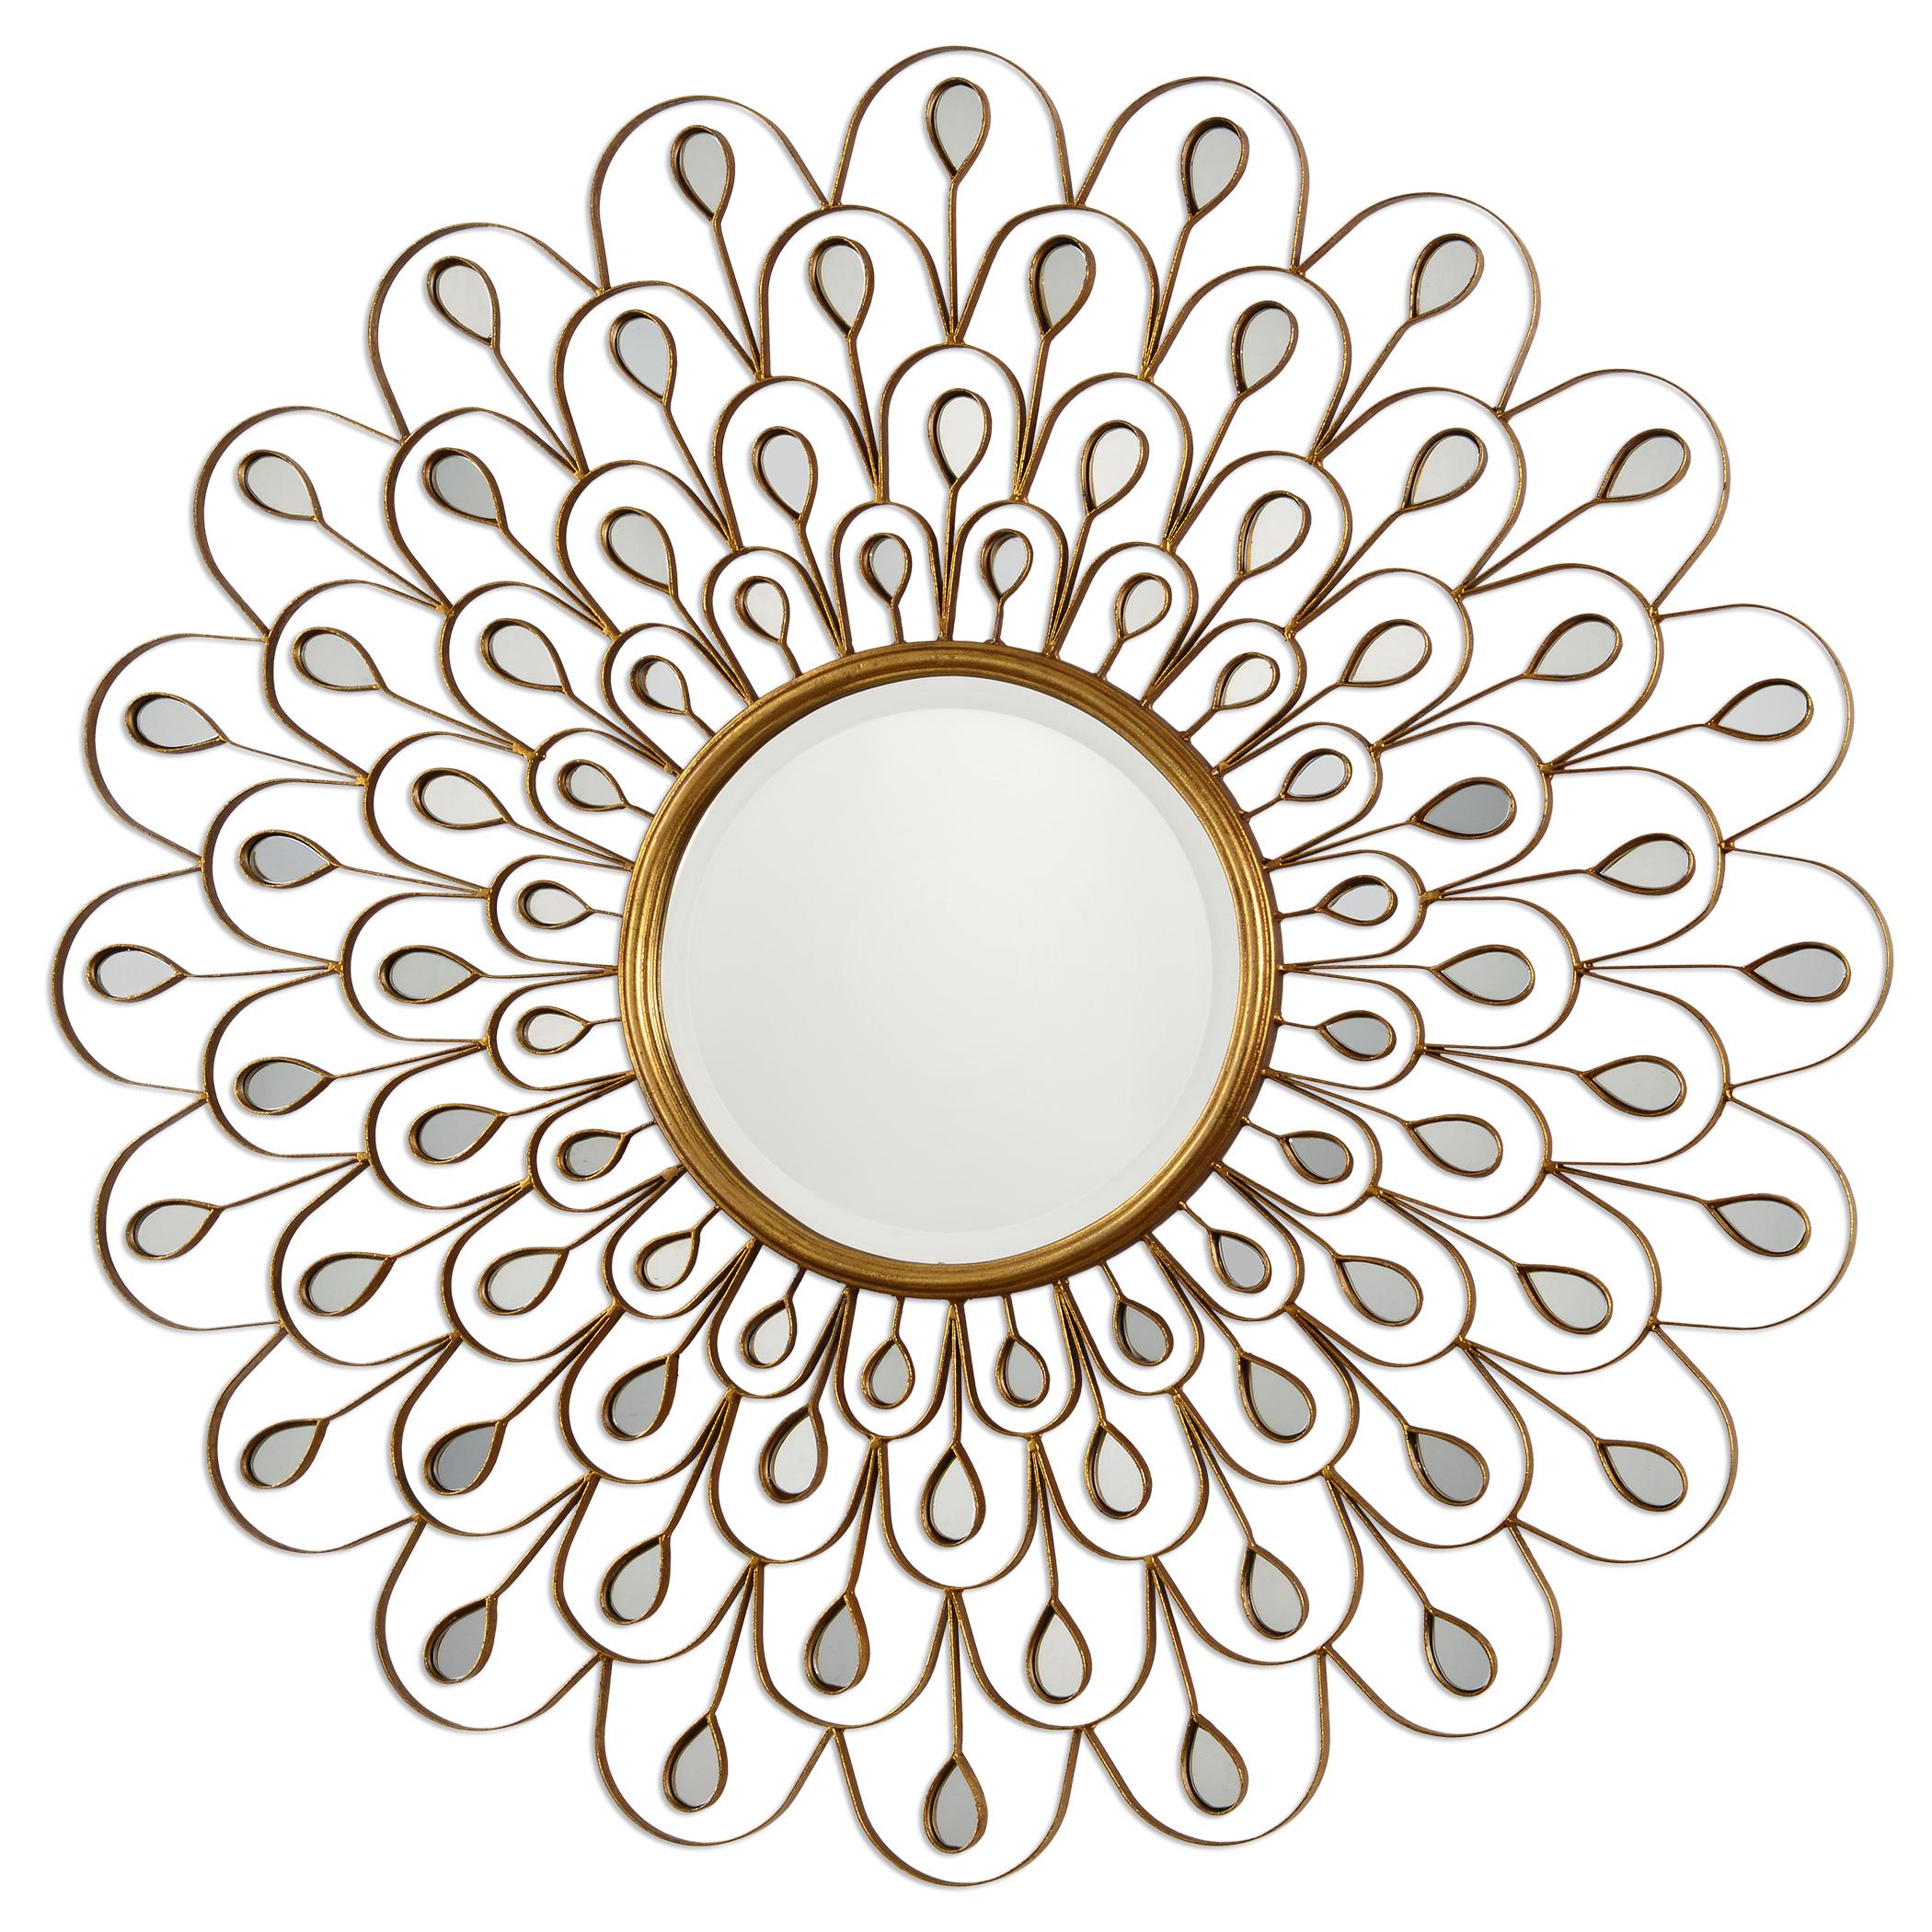 Uttermost Mirrors Golden Peacock Mirror - Item Number: 09056